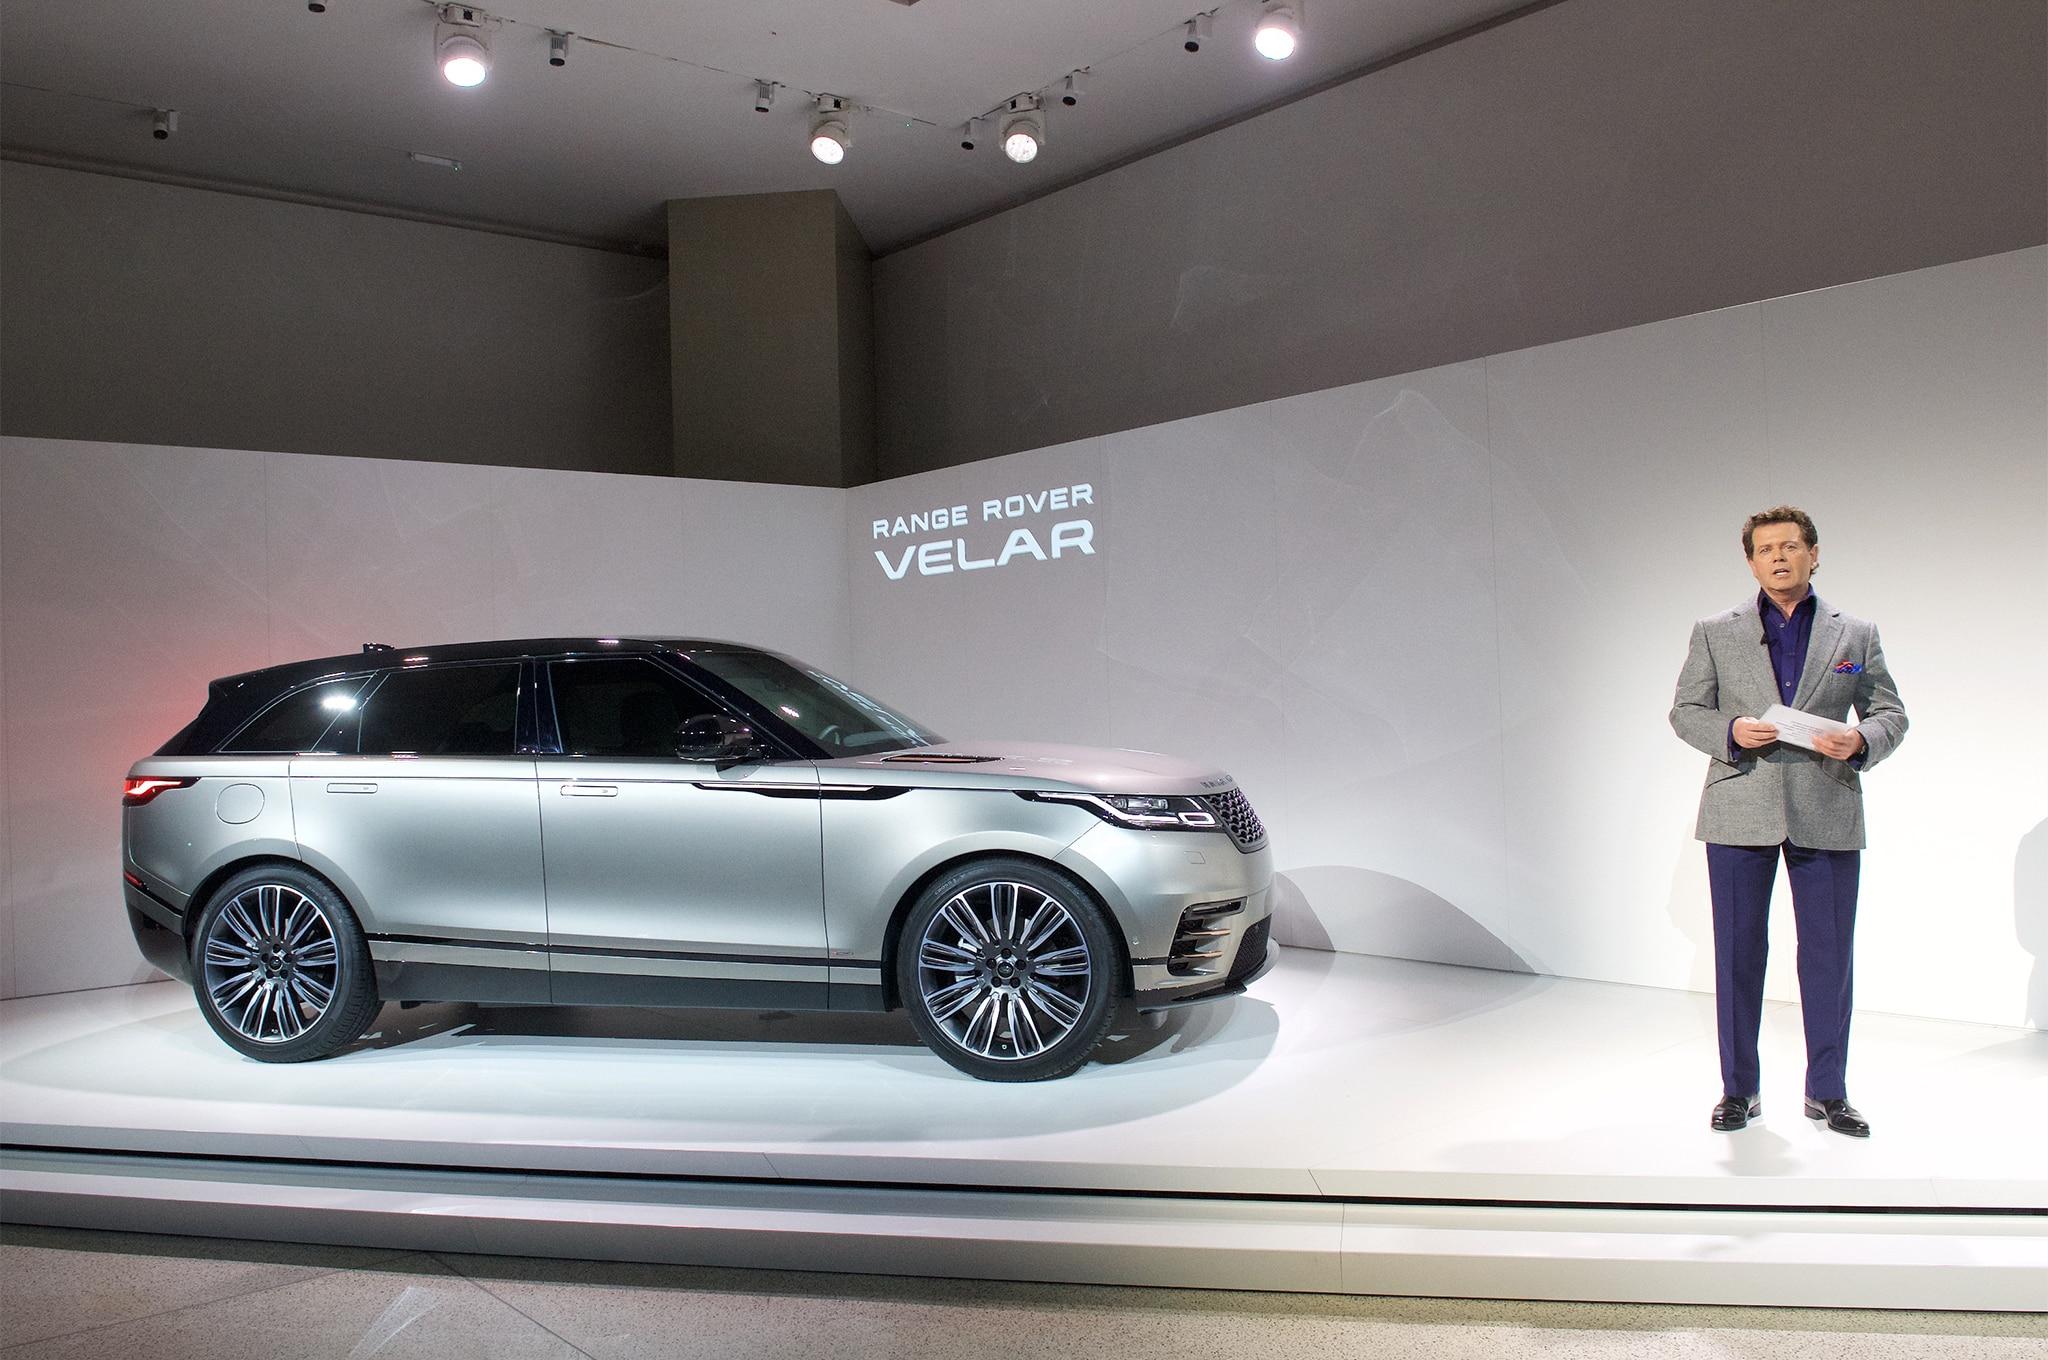 First Look: 2018 Range Rover Velar | Automobile Magazine